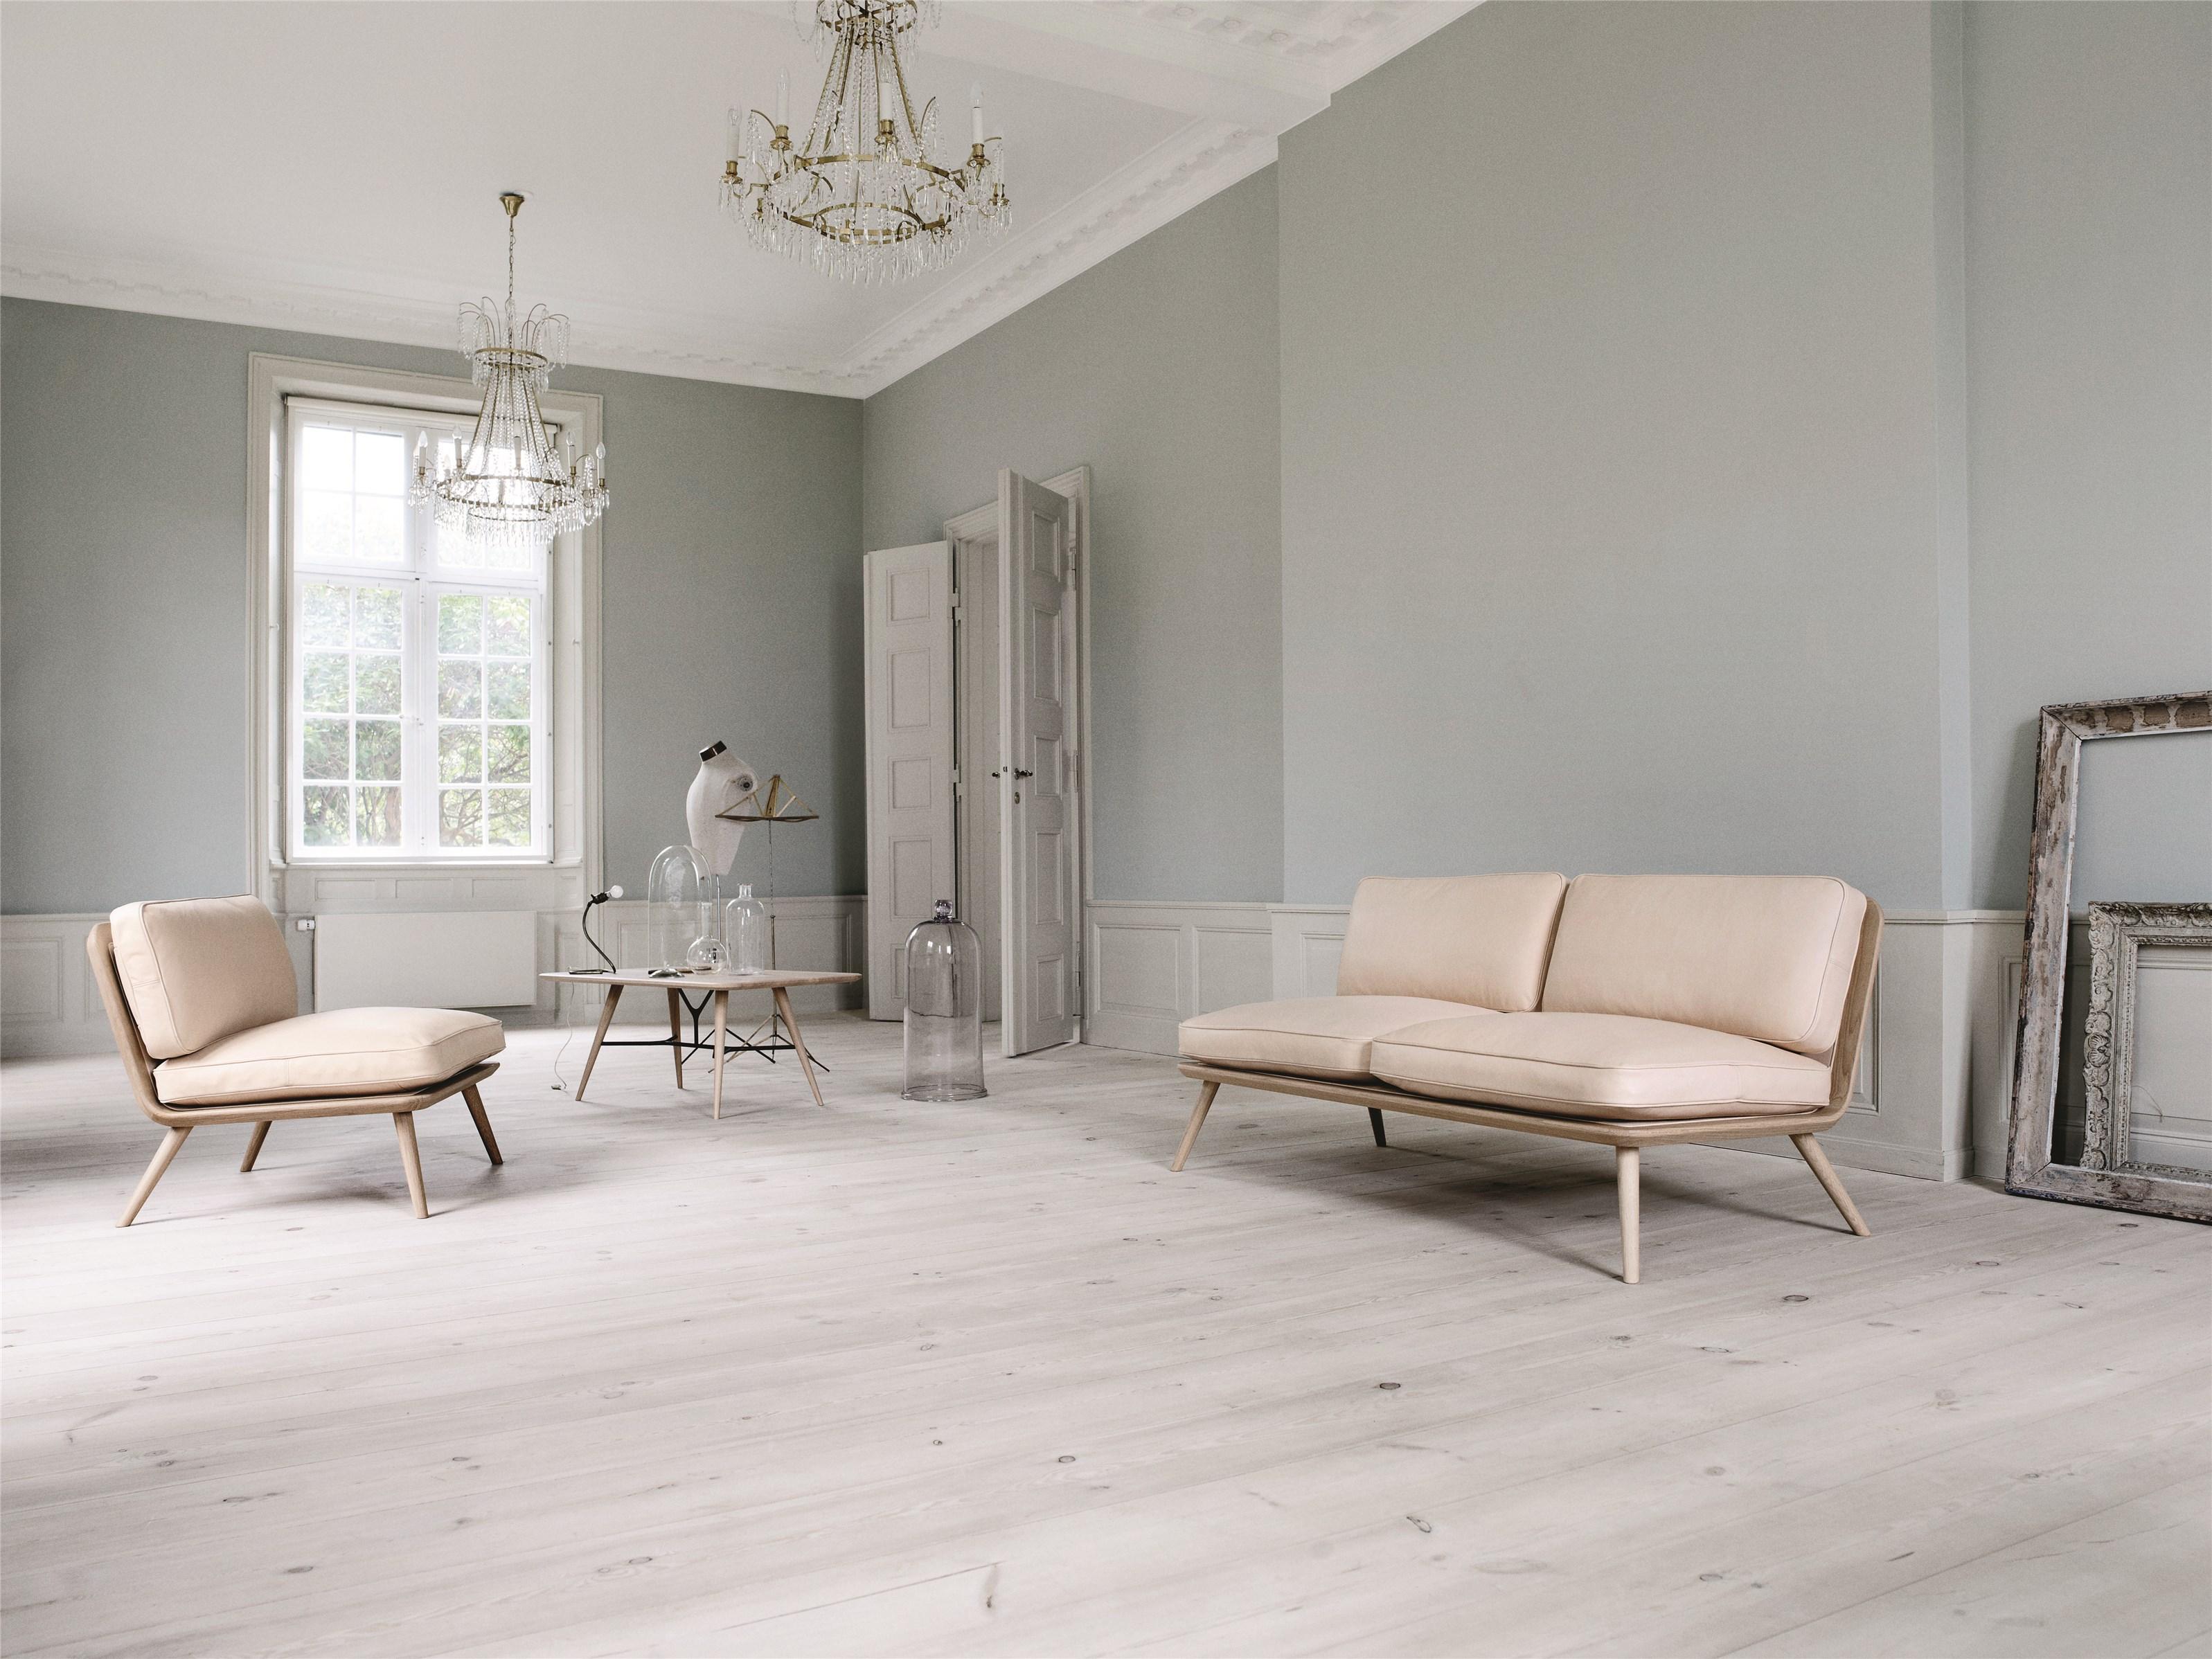 Journelles-Maison-Best-of-Scandinavian-Interior-Design-Fredericia ...